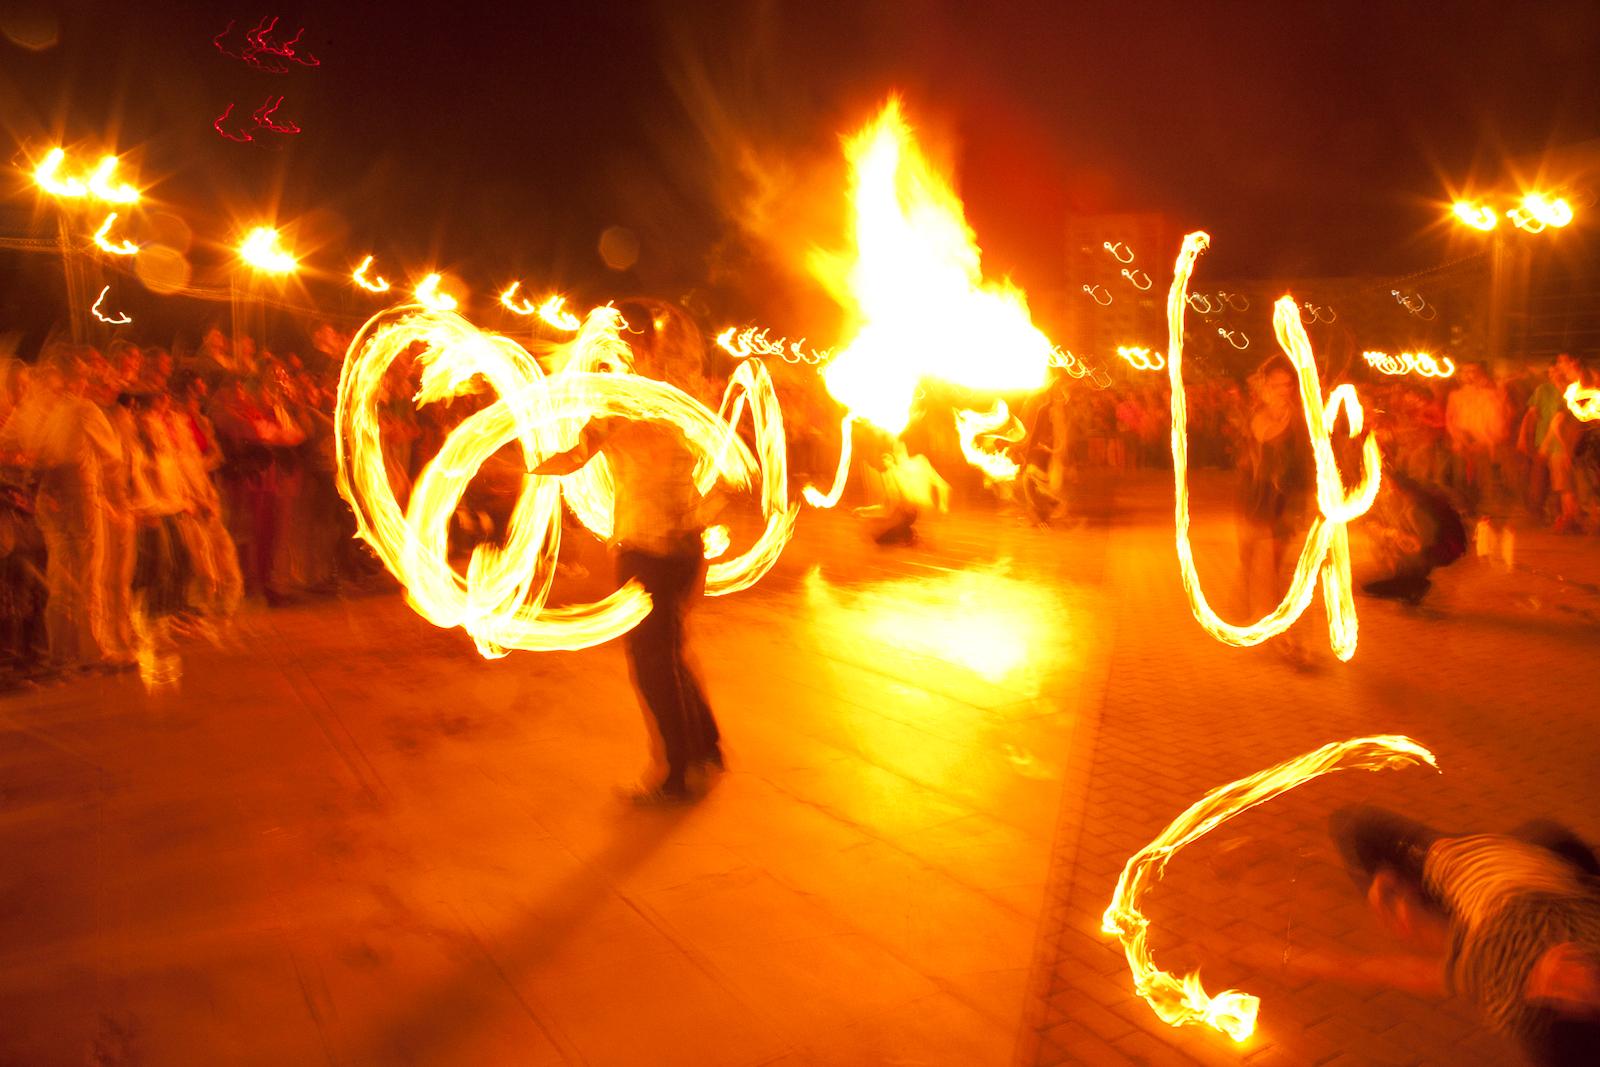 Fire show photo